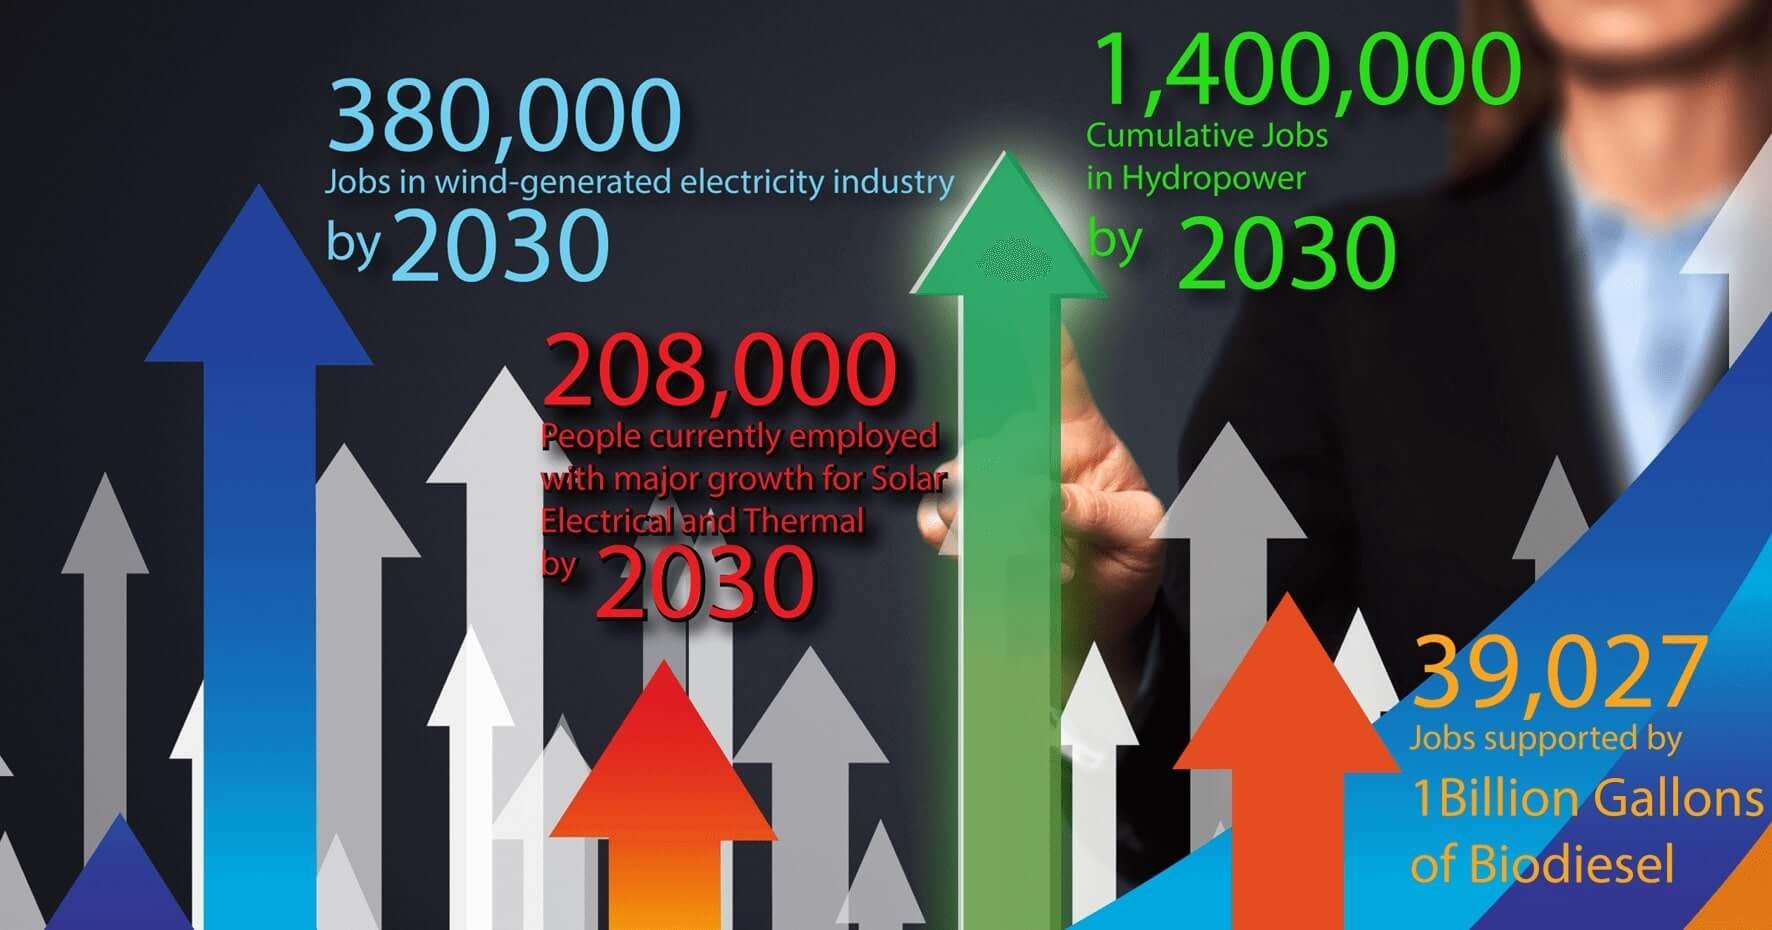 Renewable energy job prospects